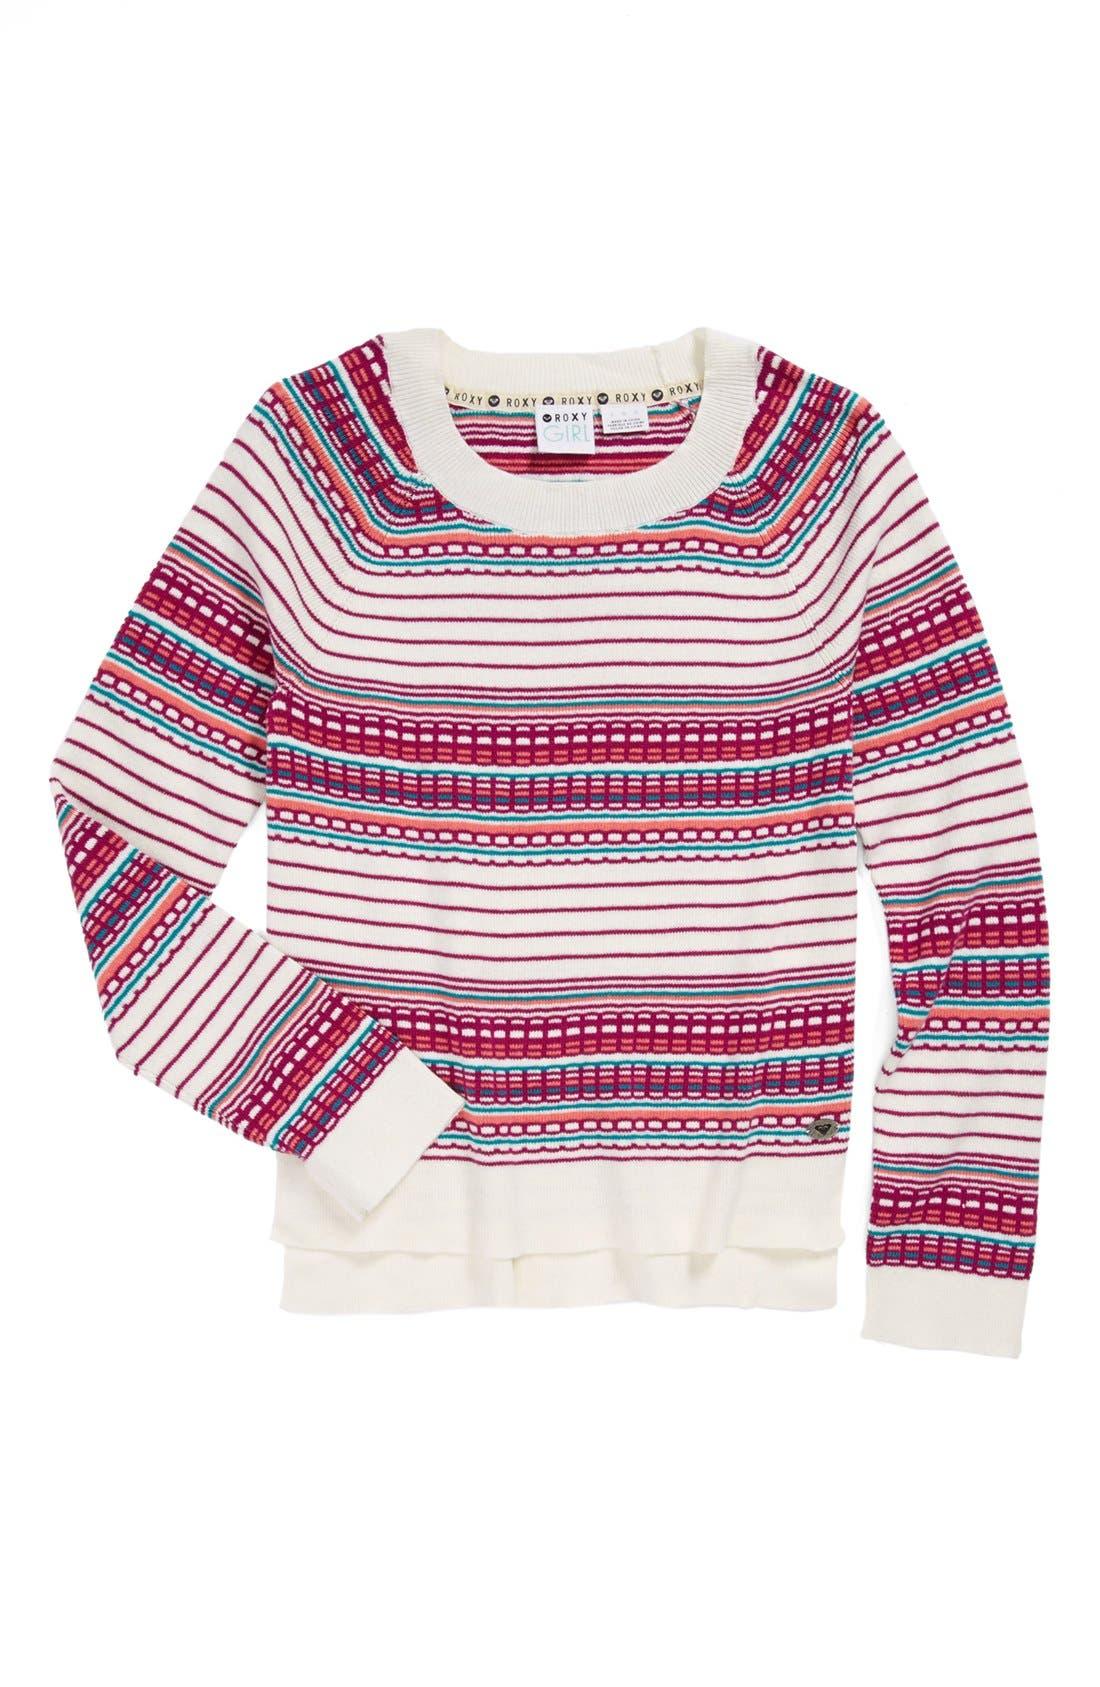 Main Image - Roxy 'In the Road' Sweater (Big Girls)